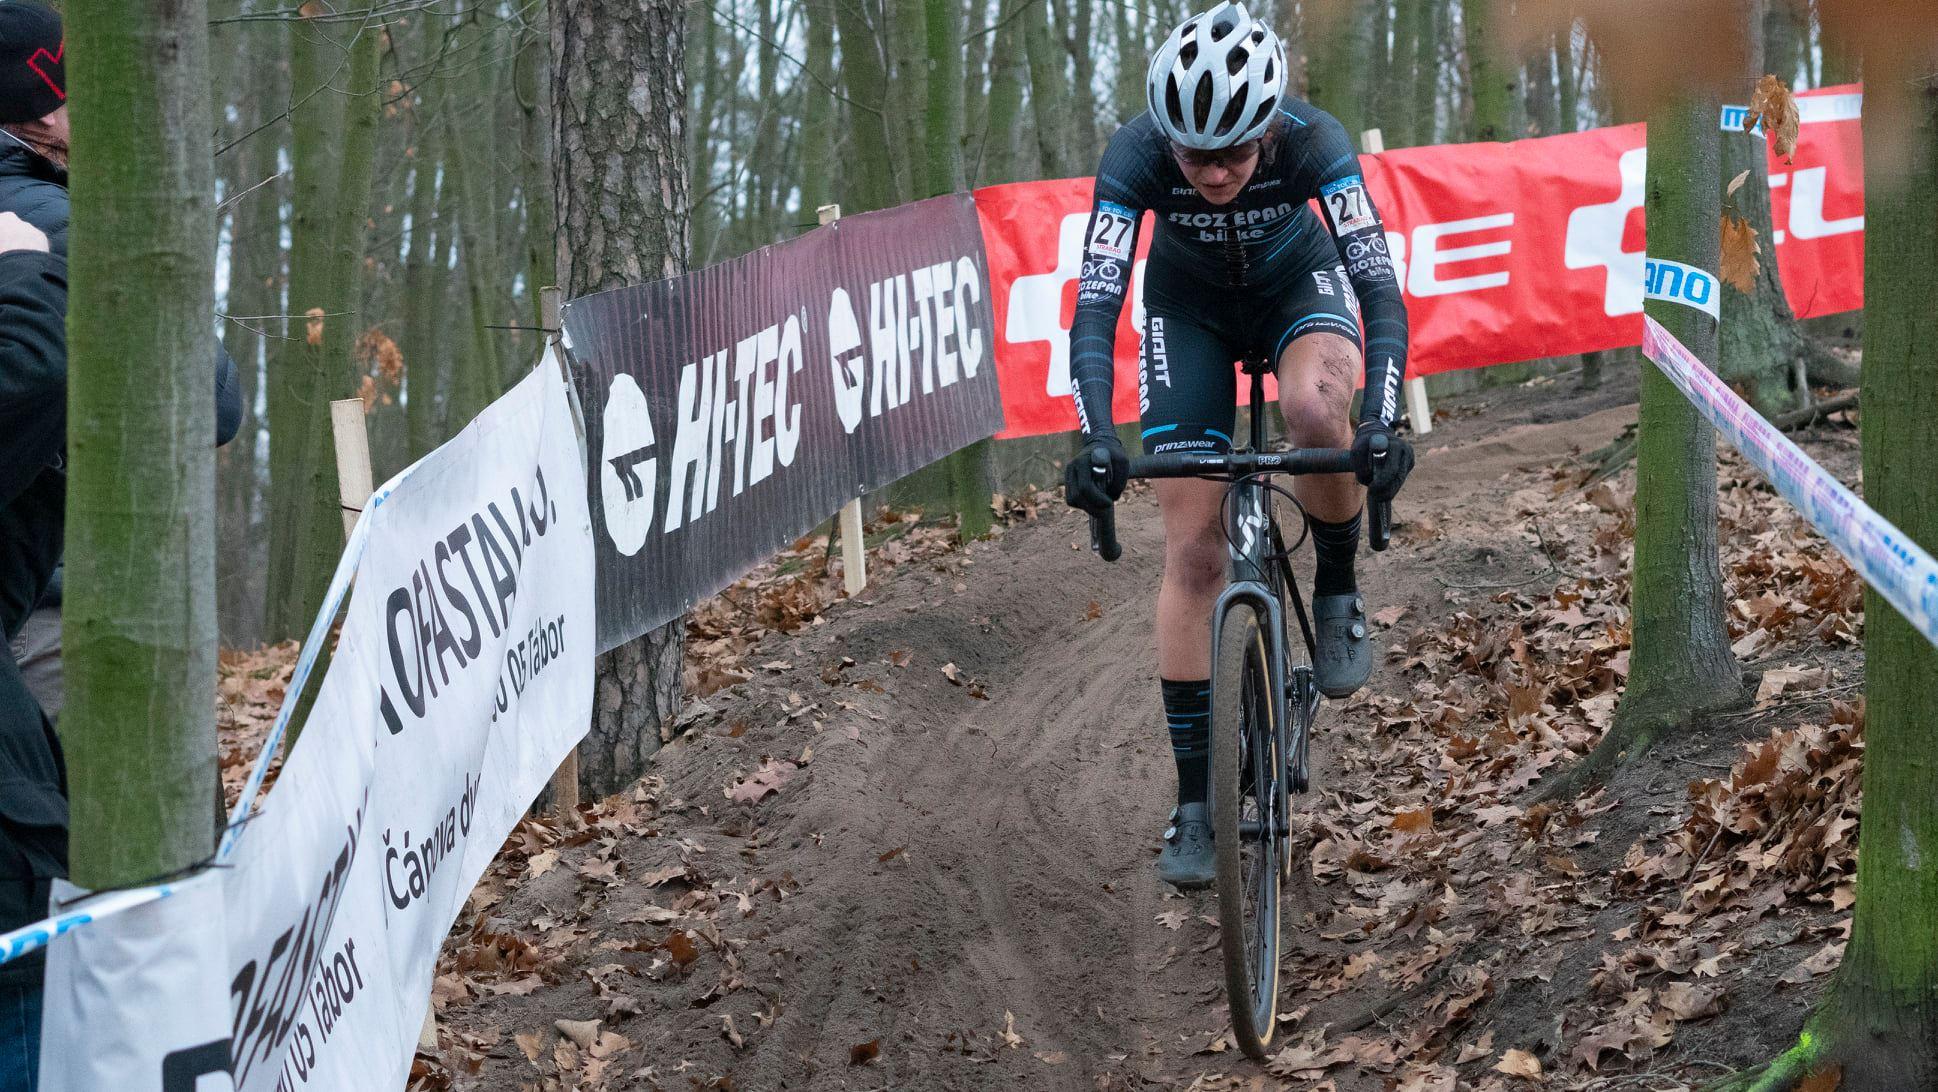 Barbara Borowiecka (Szczepan Bike) – Toi Toi Cup, Kolin (UCI C2)